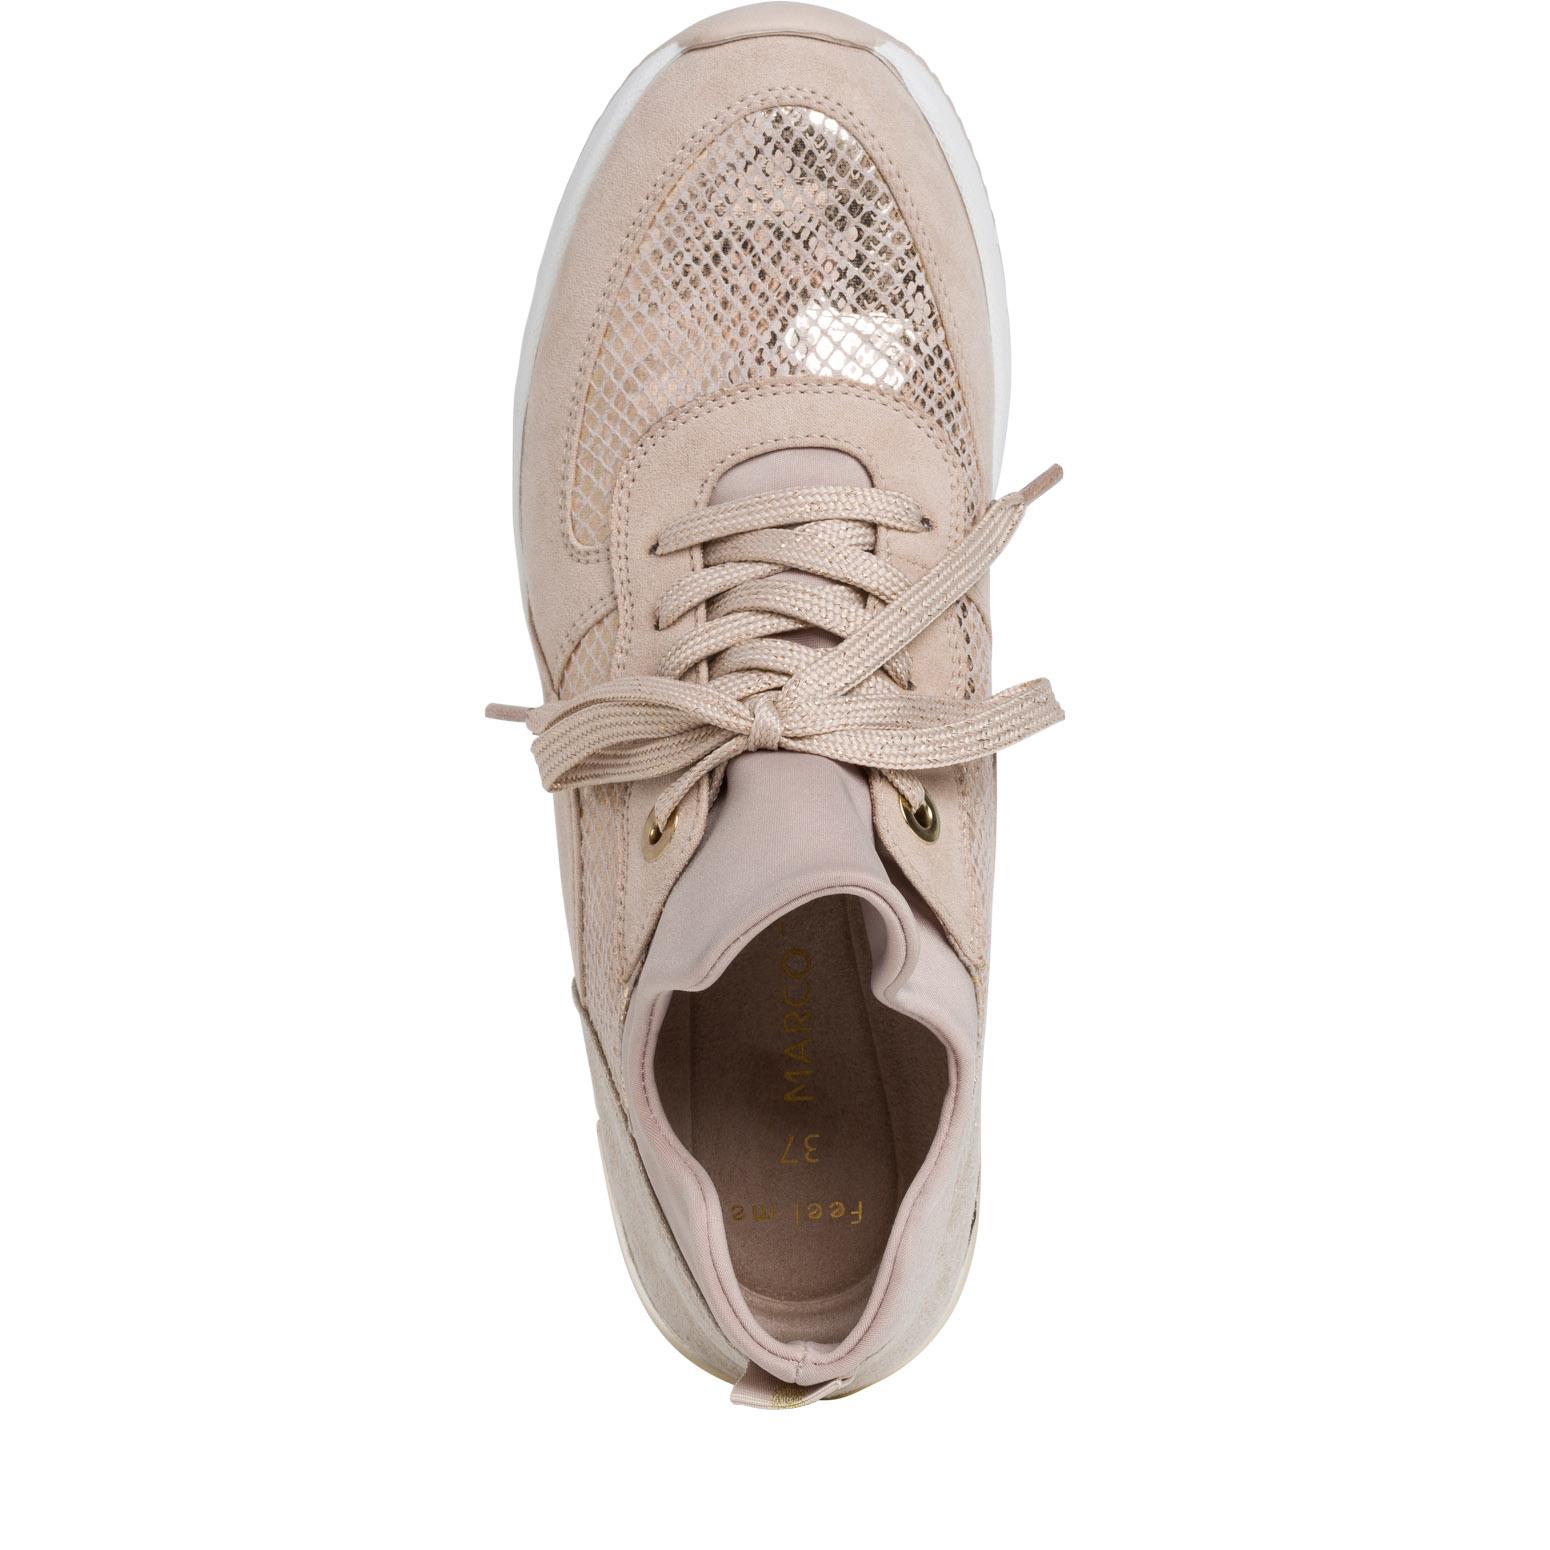 MARCO TOZZI Sneaker Femmes Merino-Laine Gris Lacets 2-23780-24neu neuf dans sa boîte